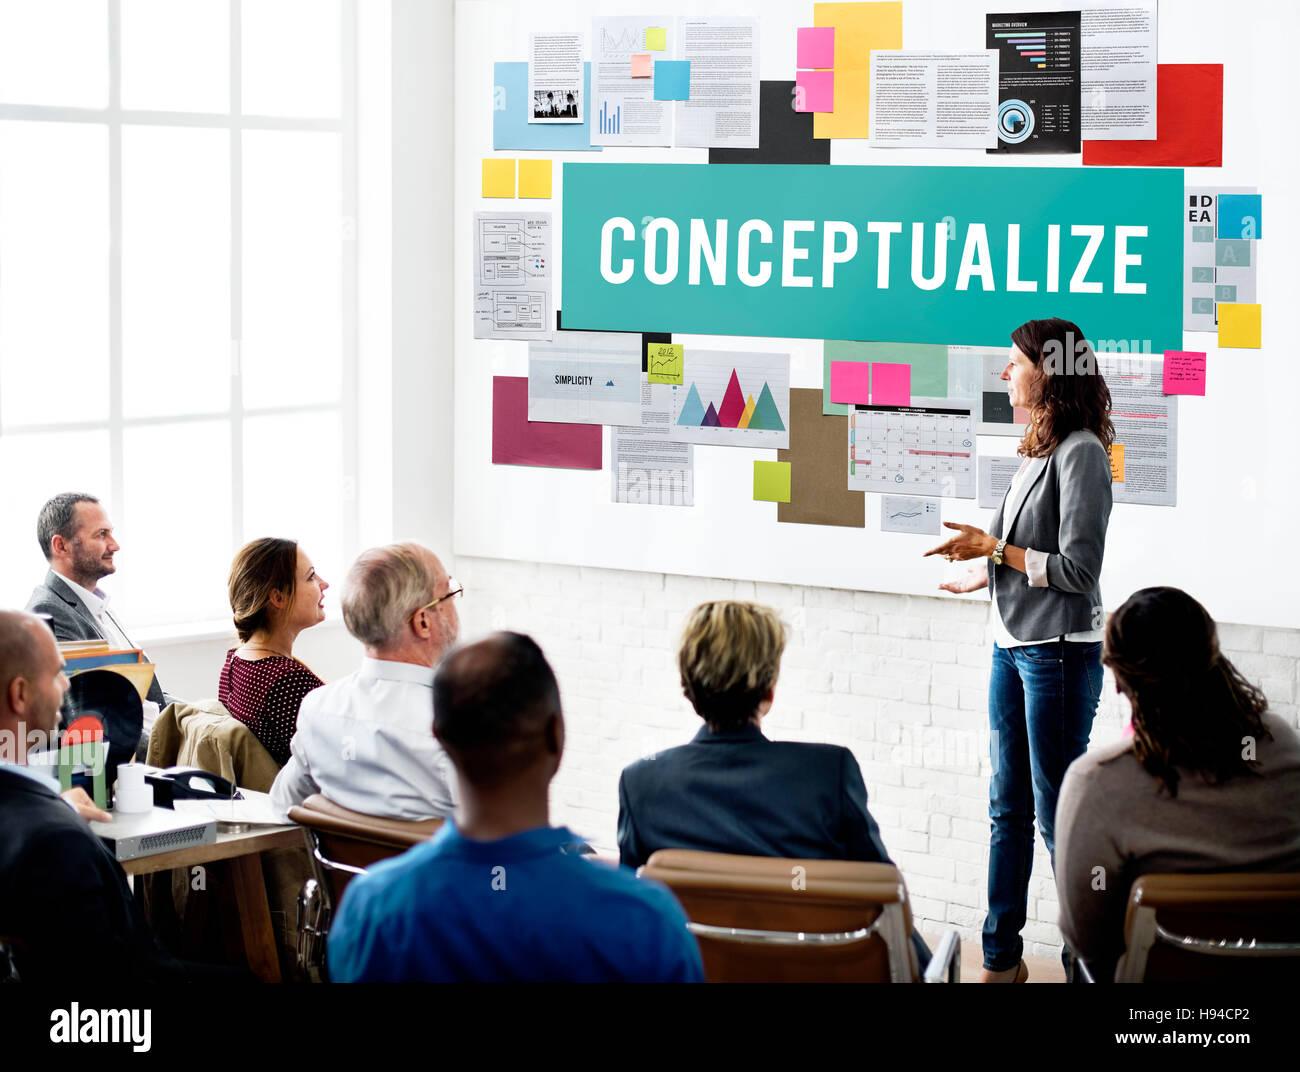 Conceptualize Intention Notion Perception Concept - Stock Image